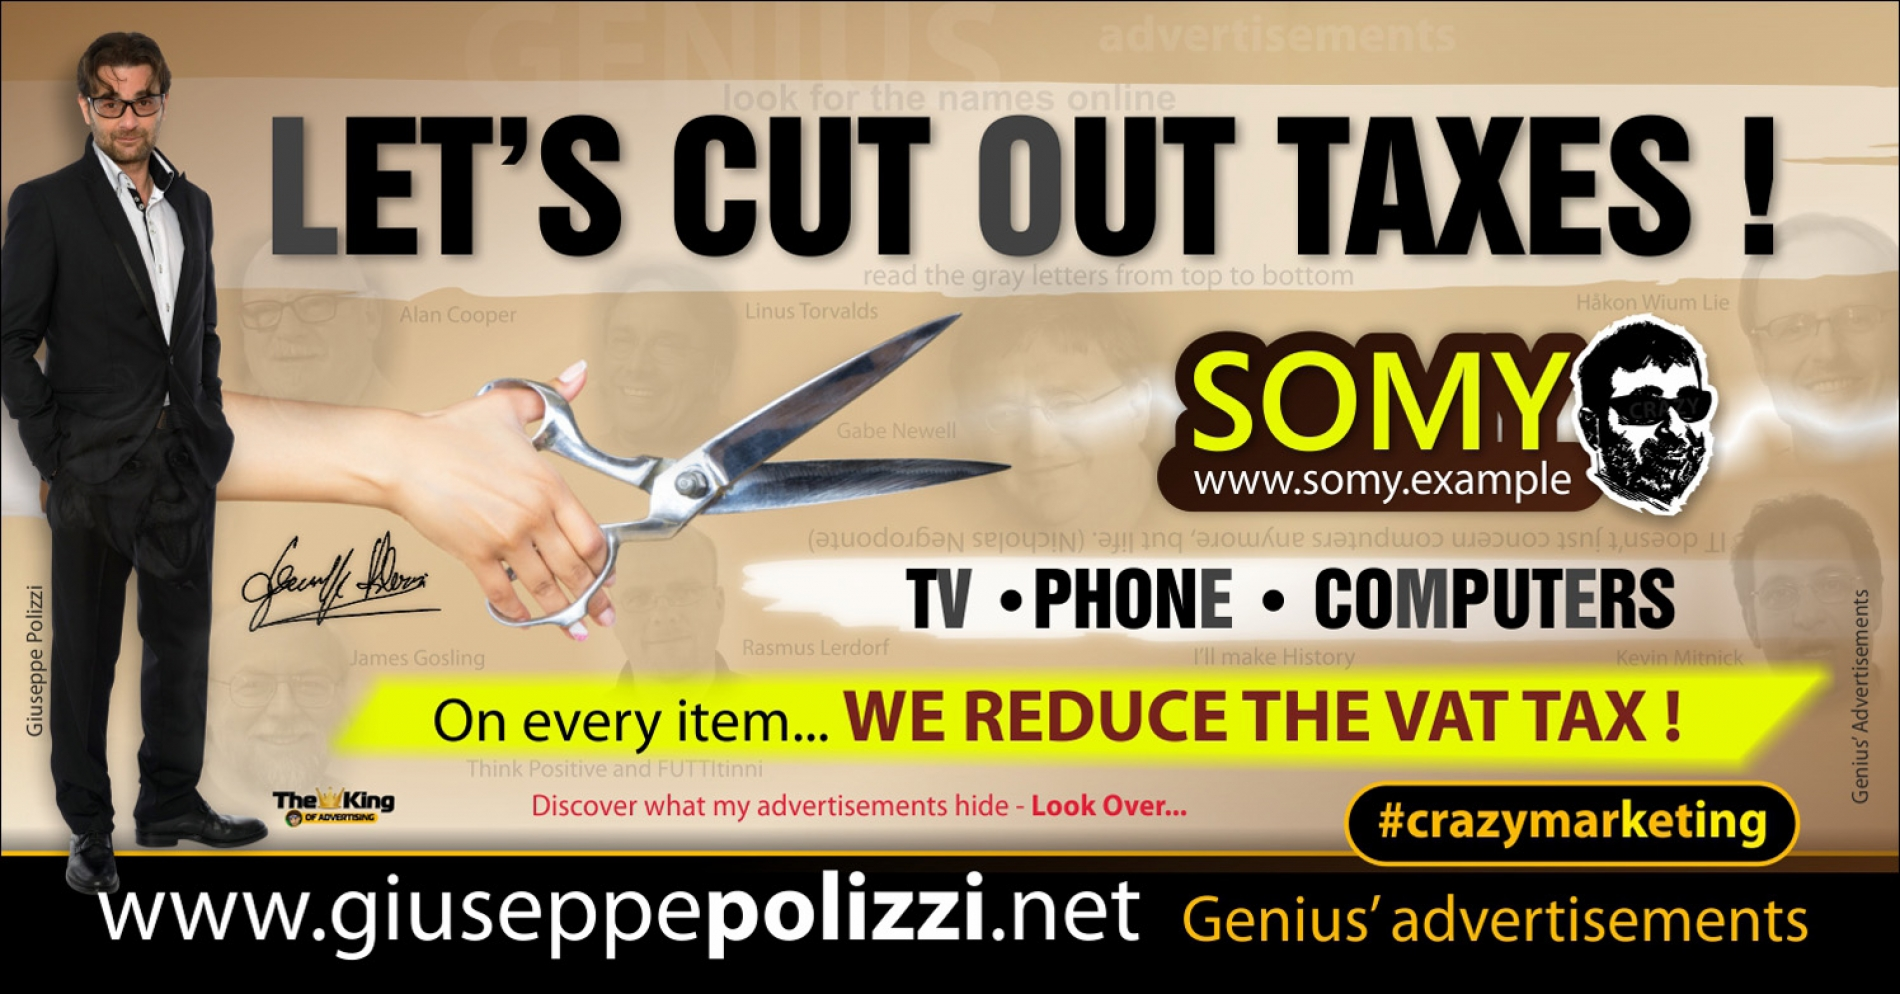 giuseppe polizzi crazymarketing Cut  Out Taxes genius  2018 advertising